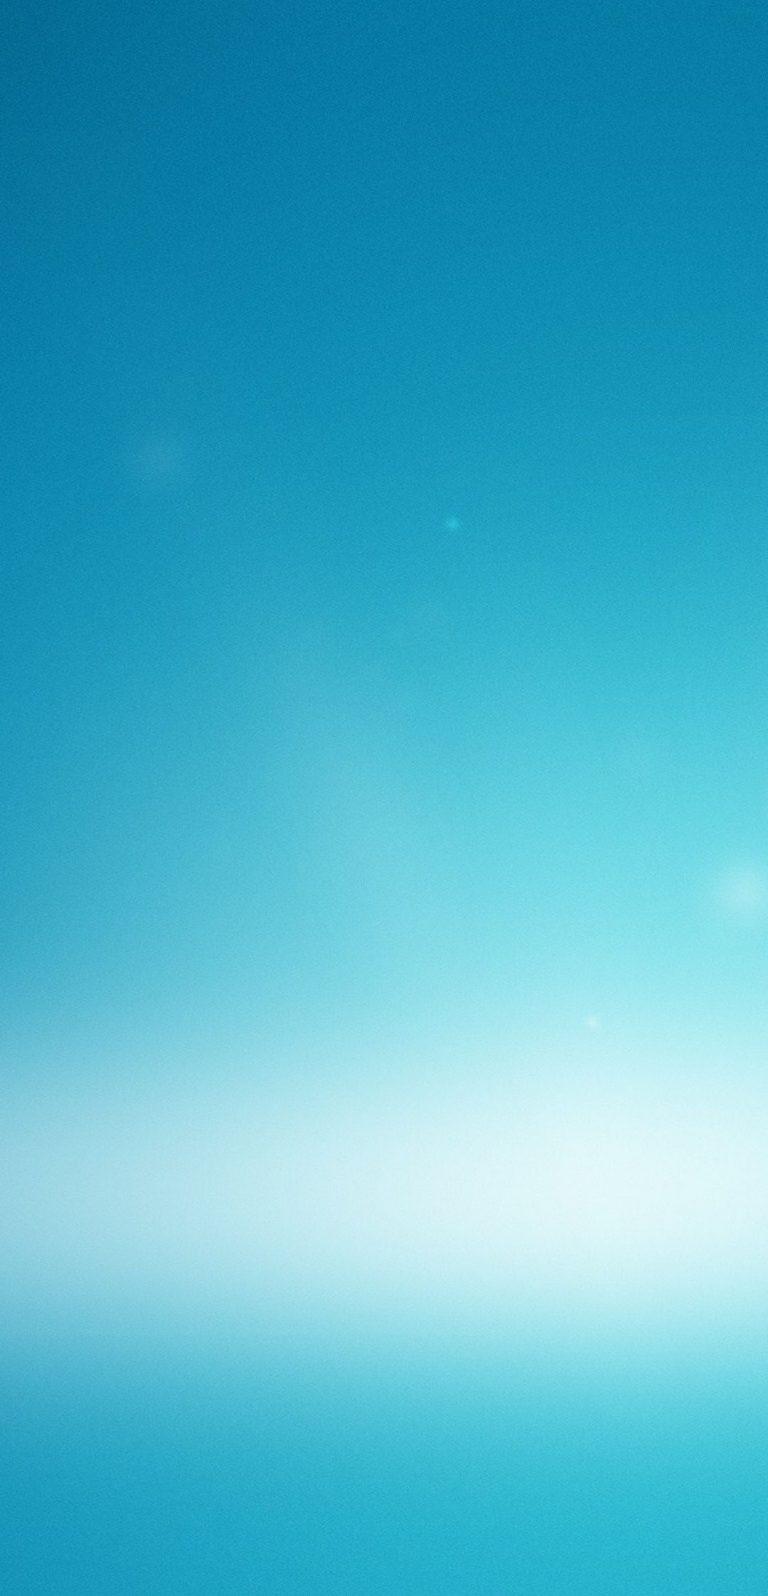 Light Shadow Blur 1080x2244 768x1596